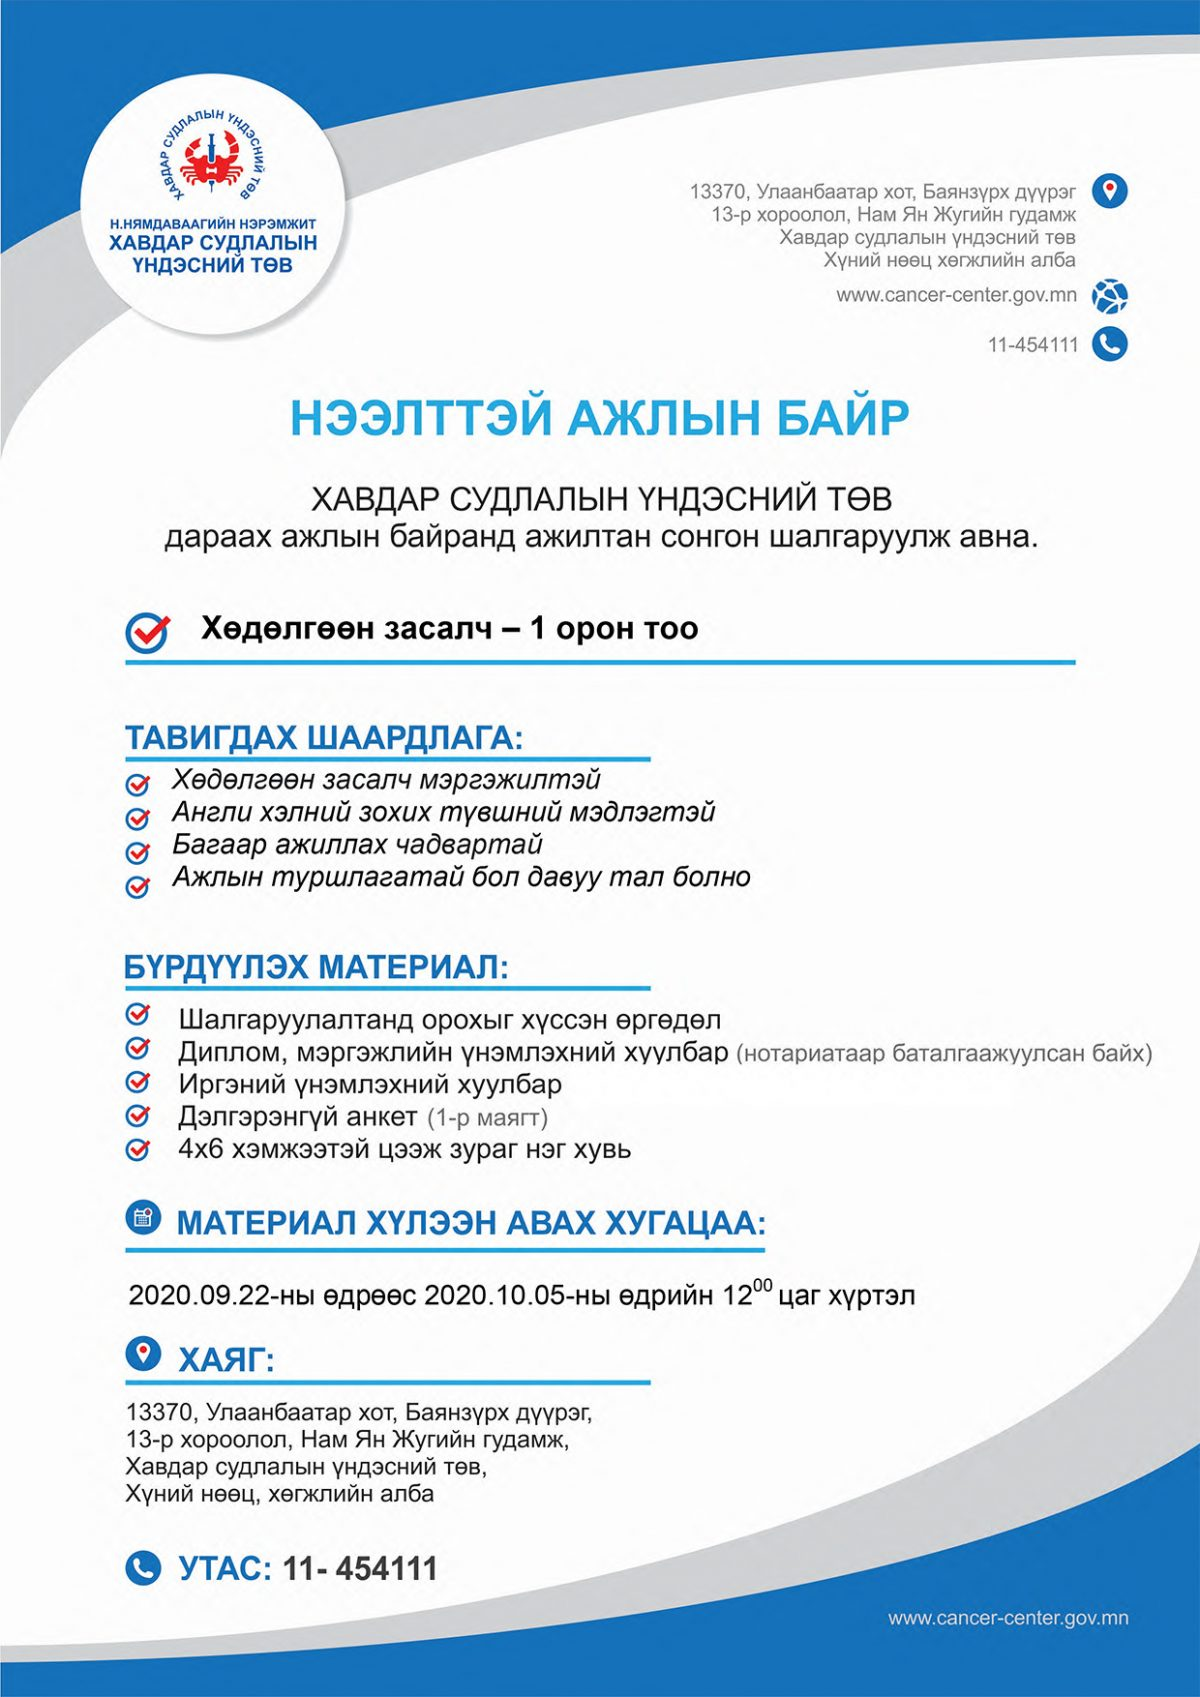 zar-2-copy-1200x1697.jpg